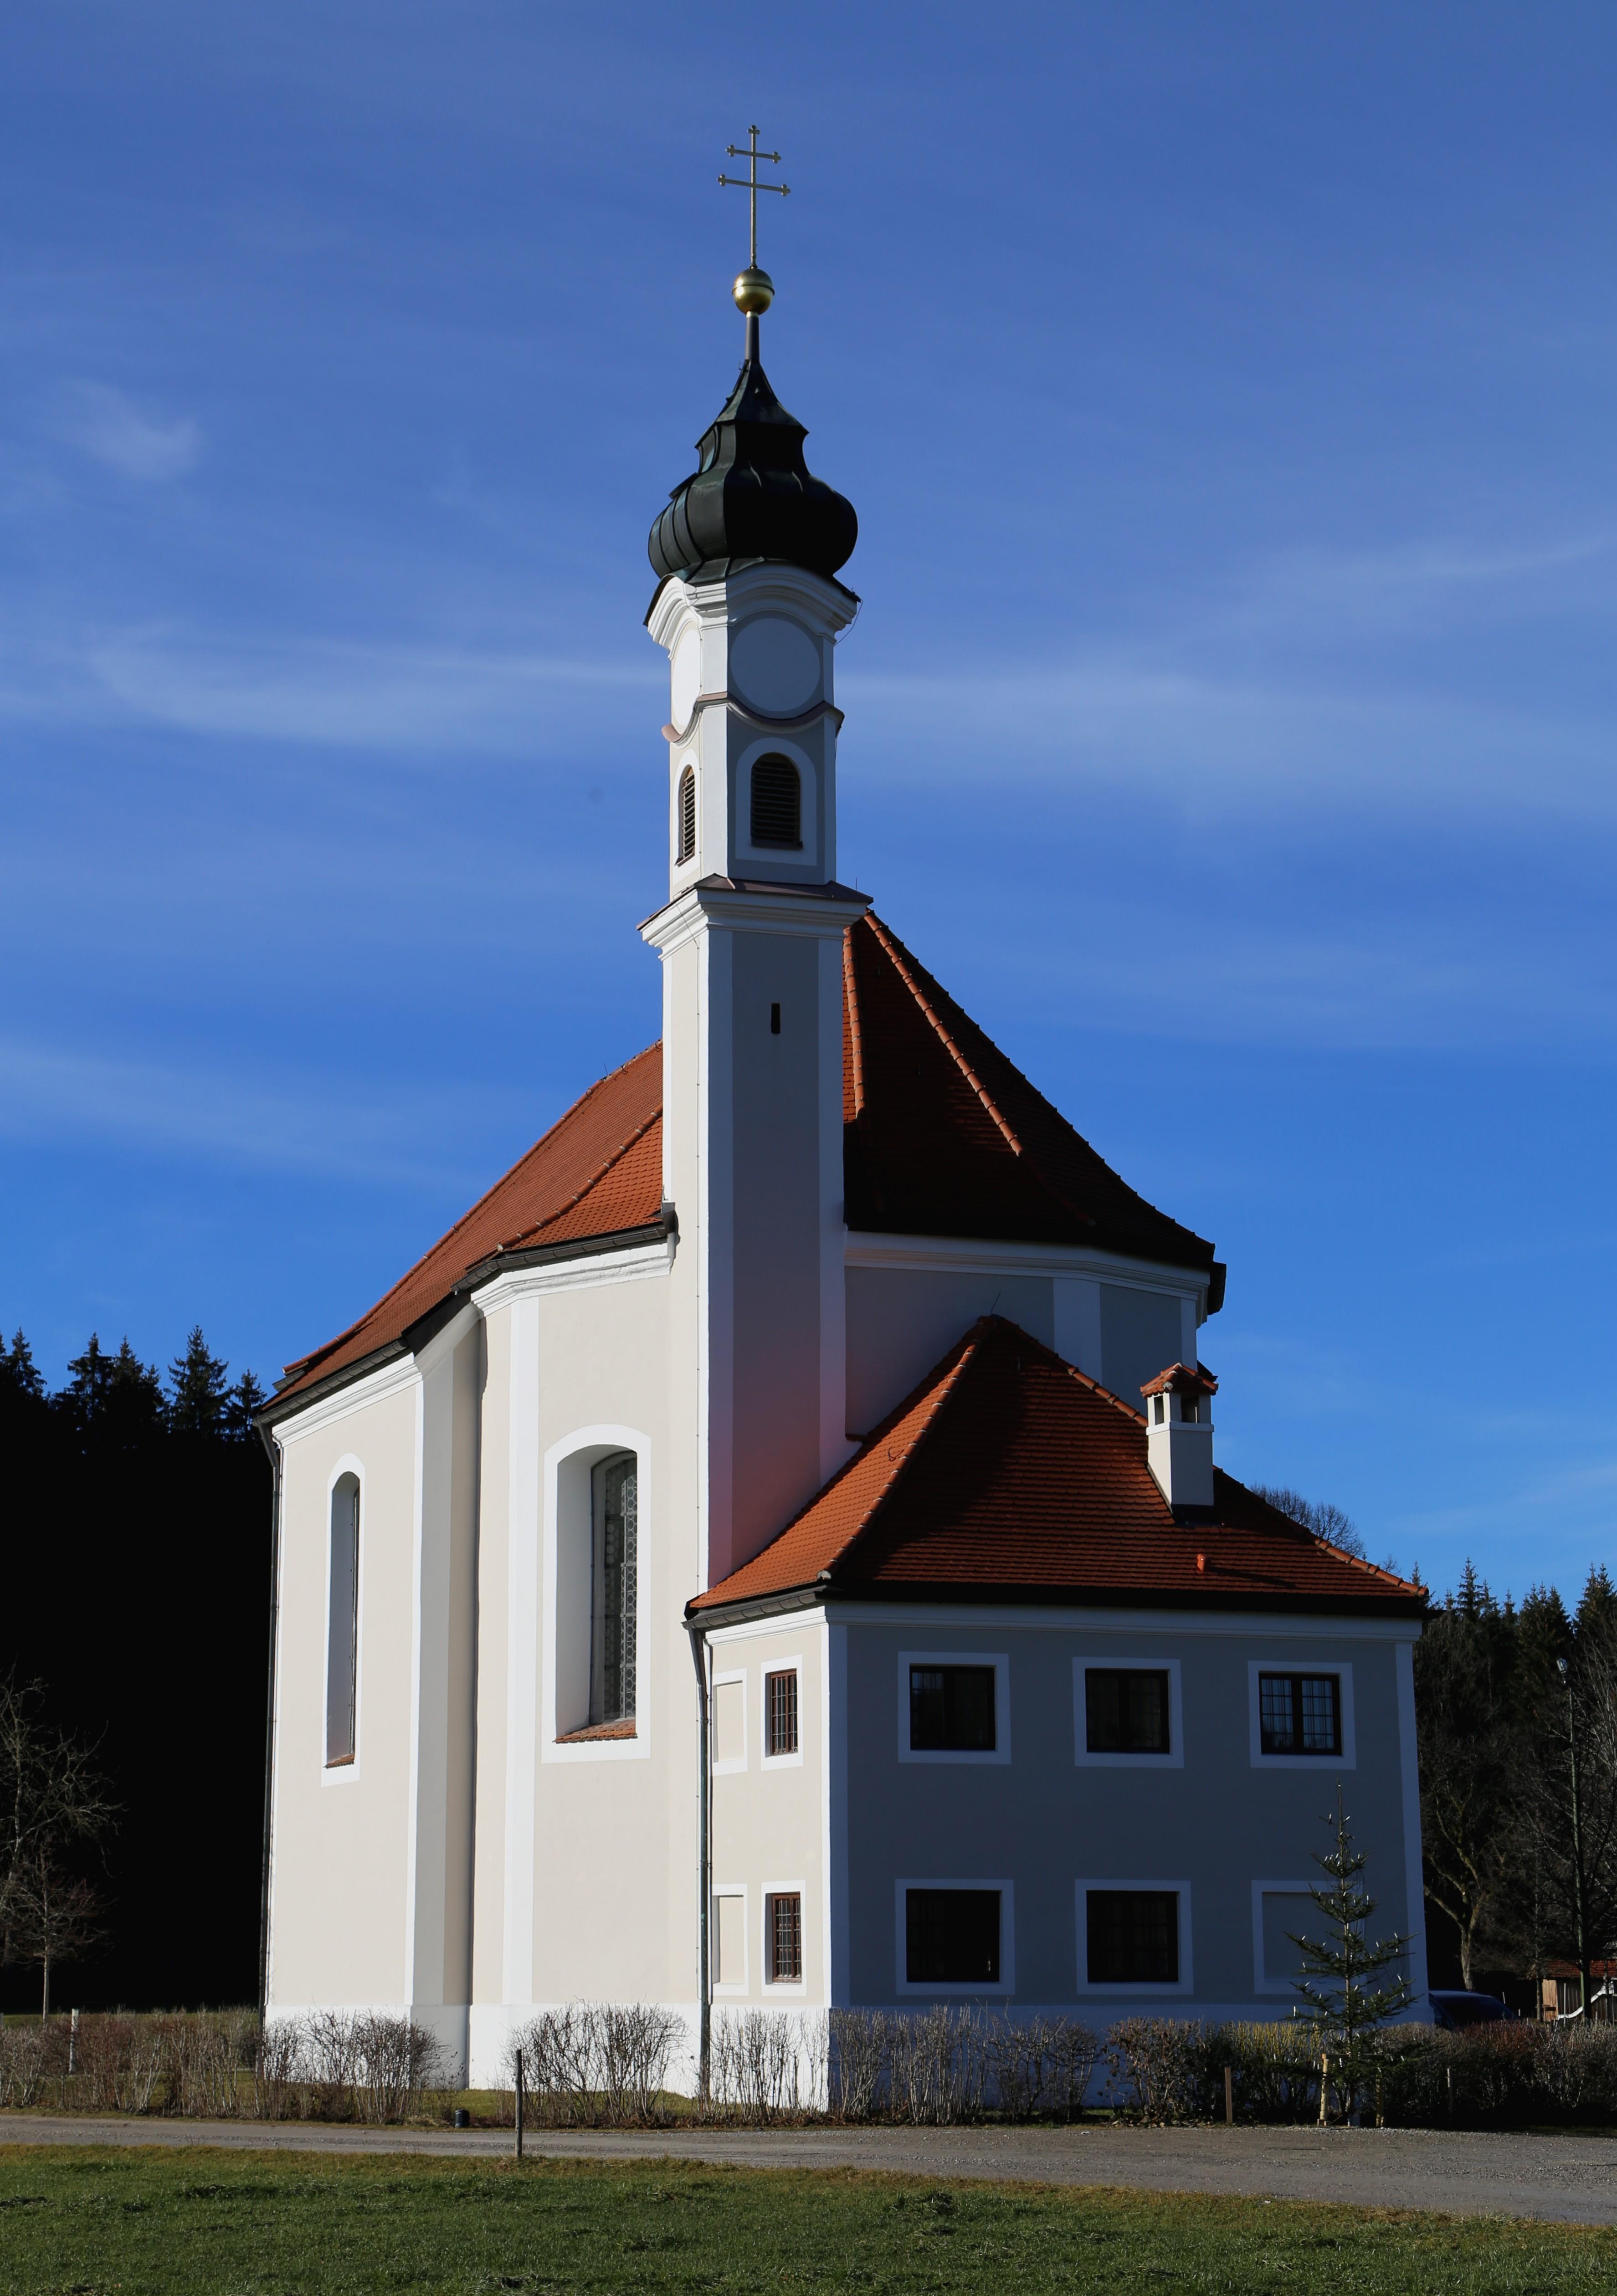 St Leonhard Dietramszell